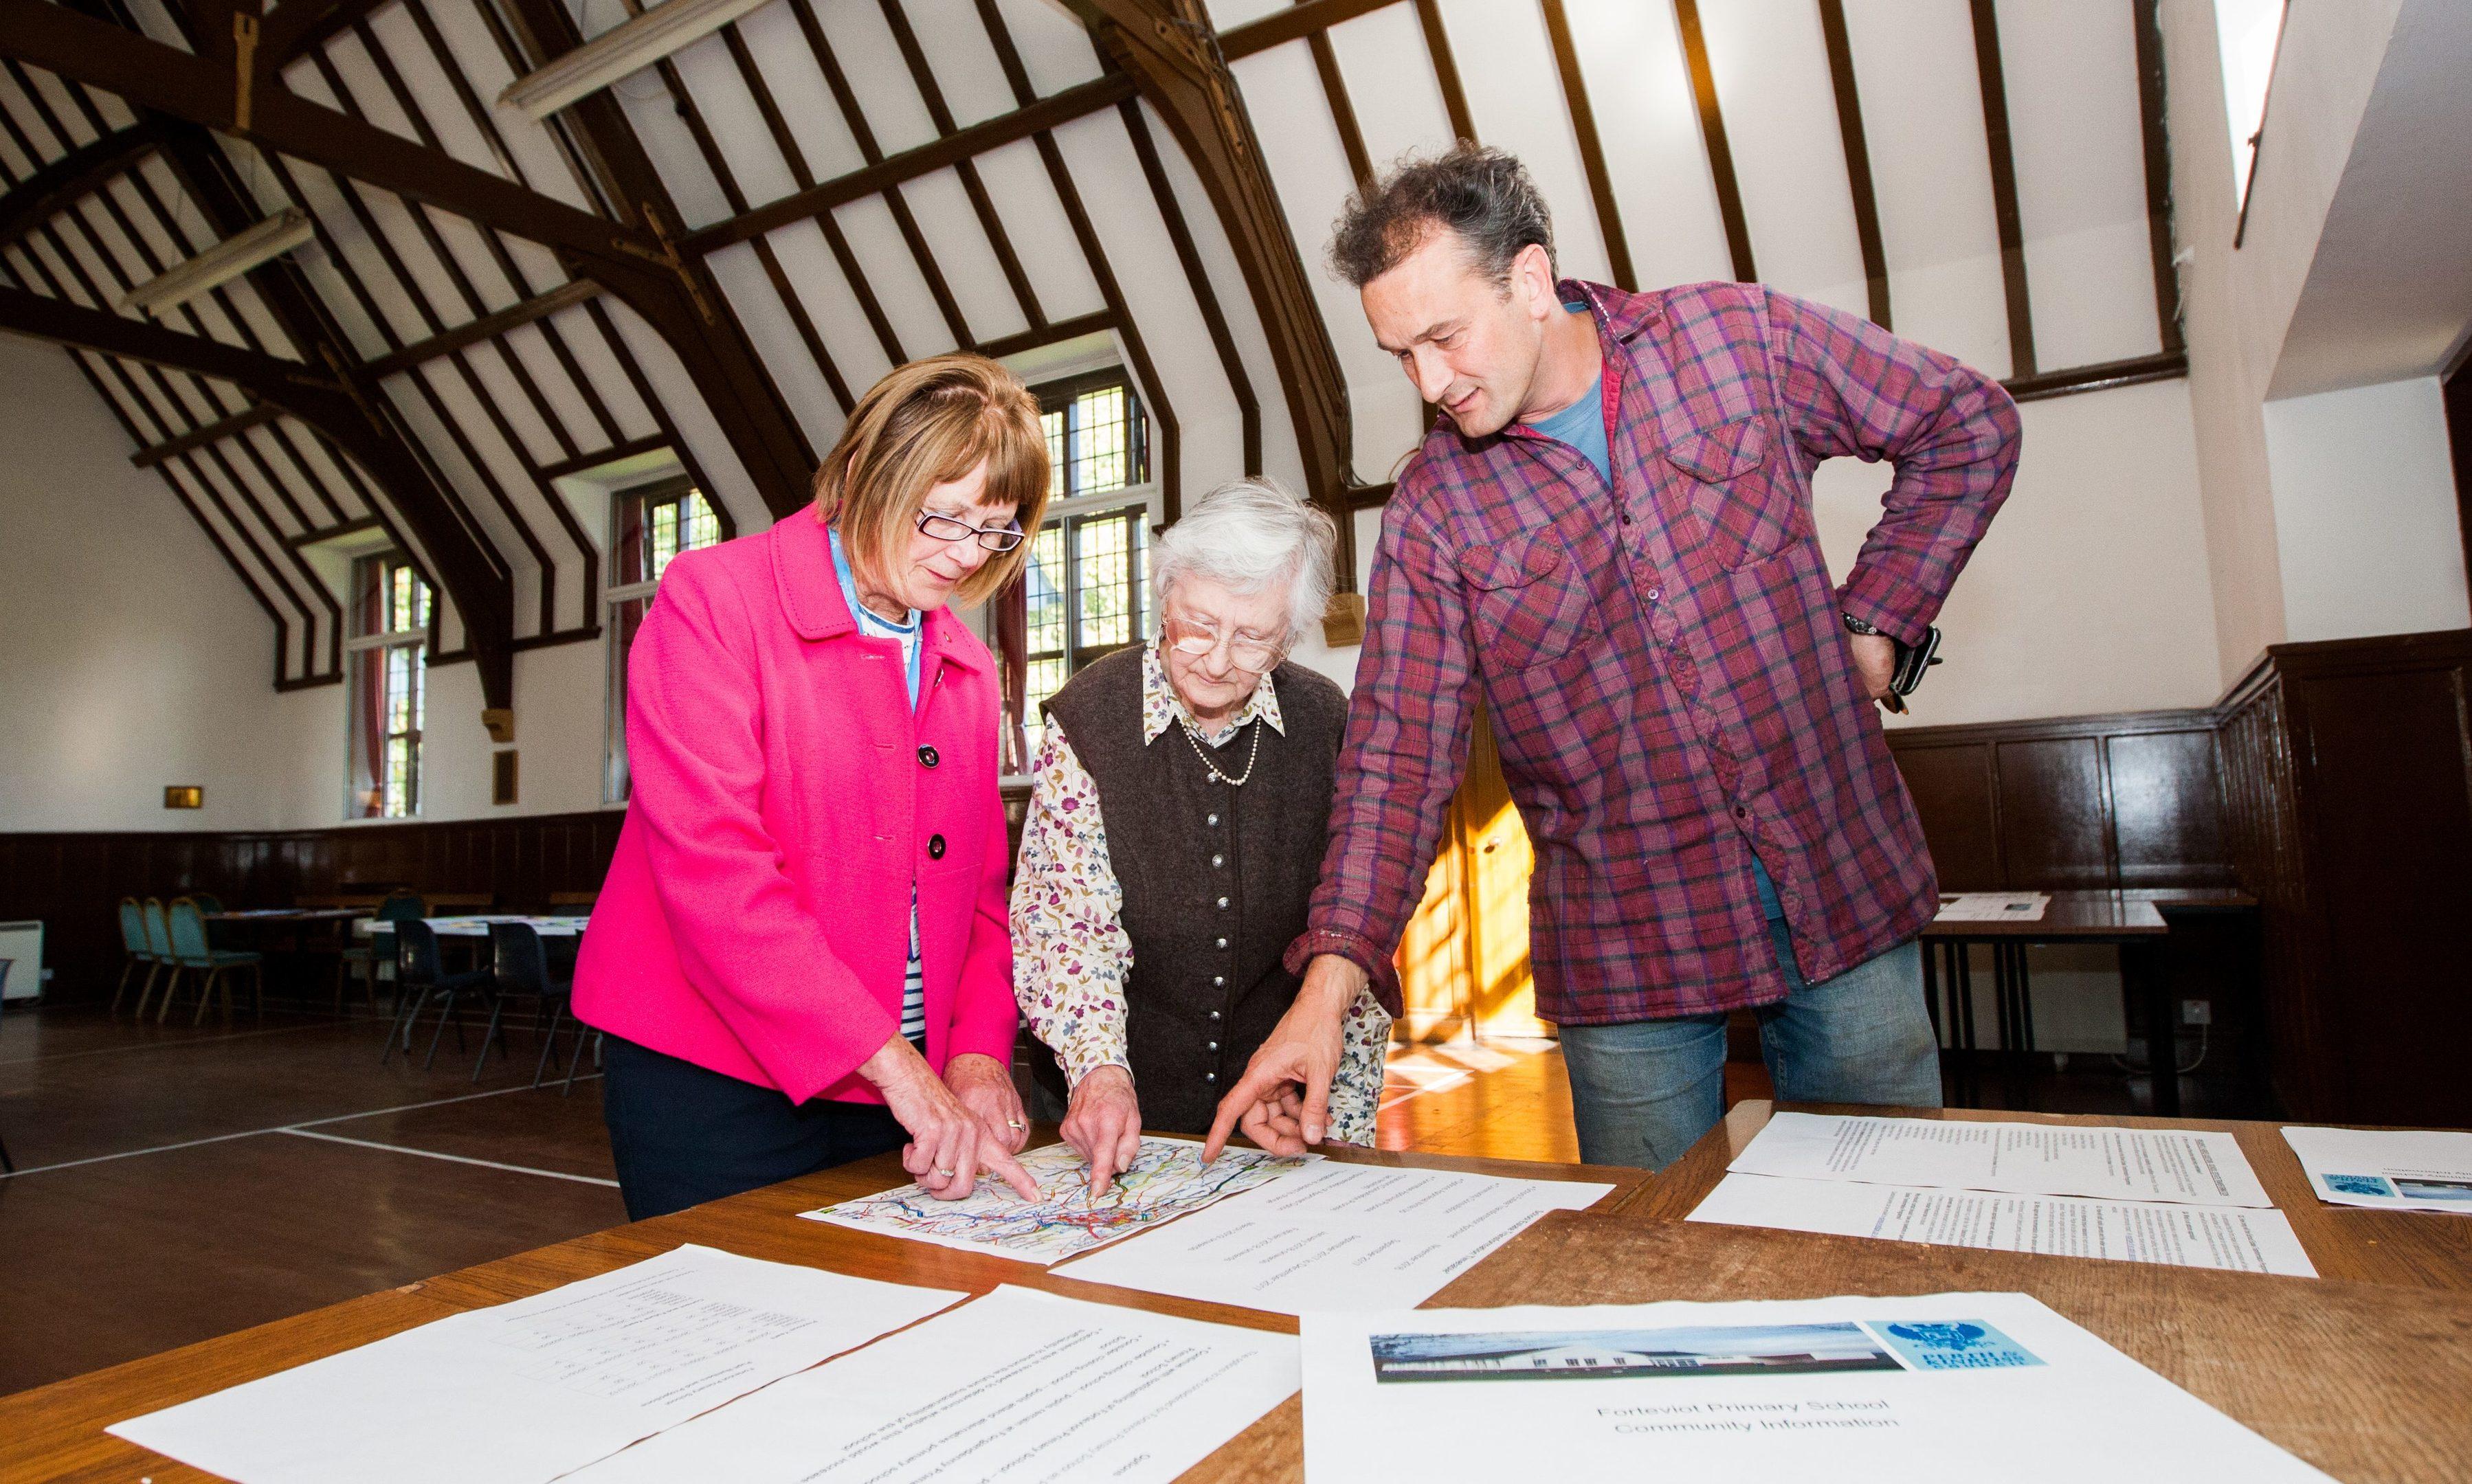 Councillor Kathleen Baird, Diana Roff (Earn Community Council) and Alexander Dewar (Dupplin Estate) consider proposals at the Village Hall, Forteviot.